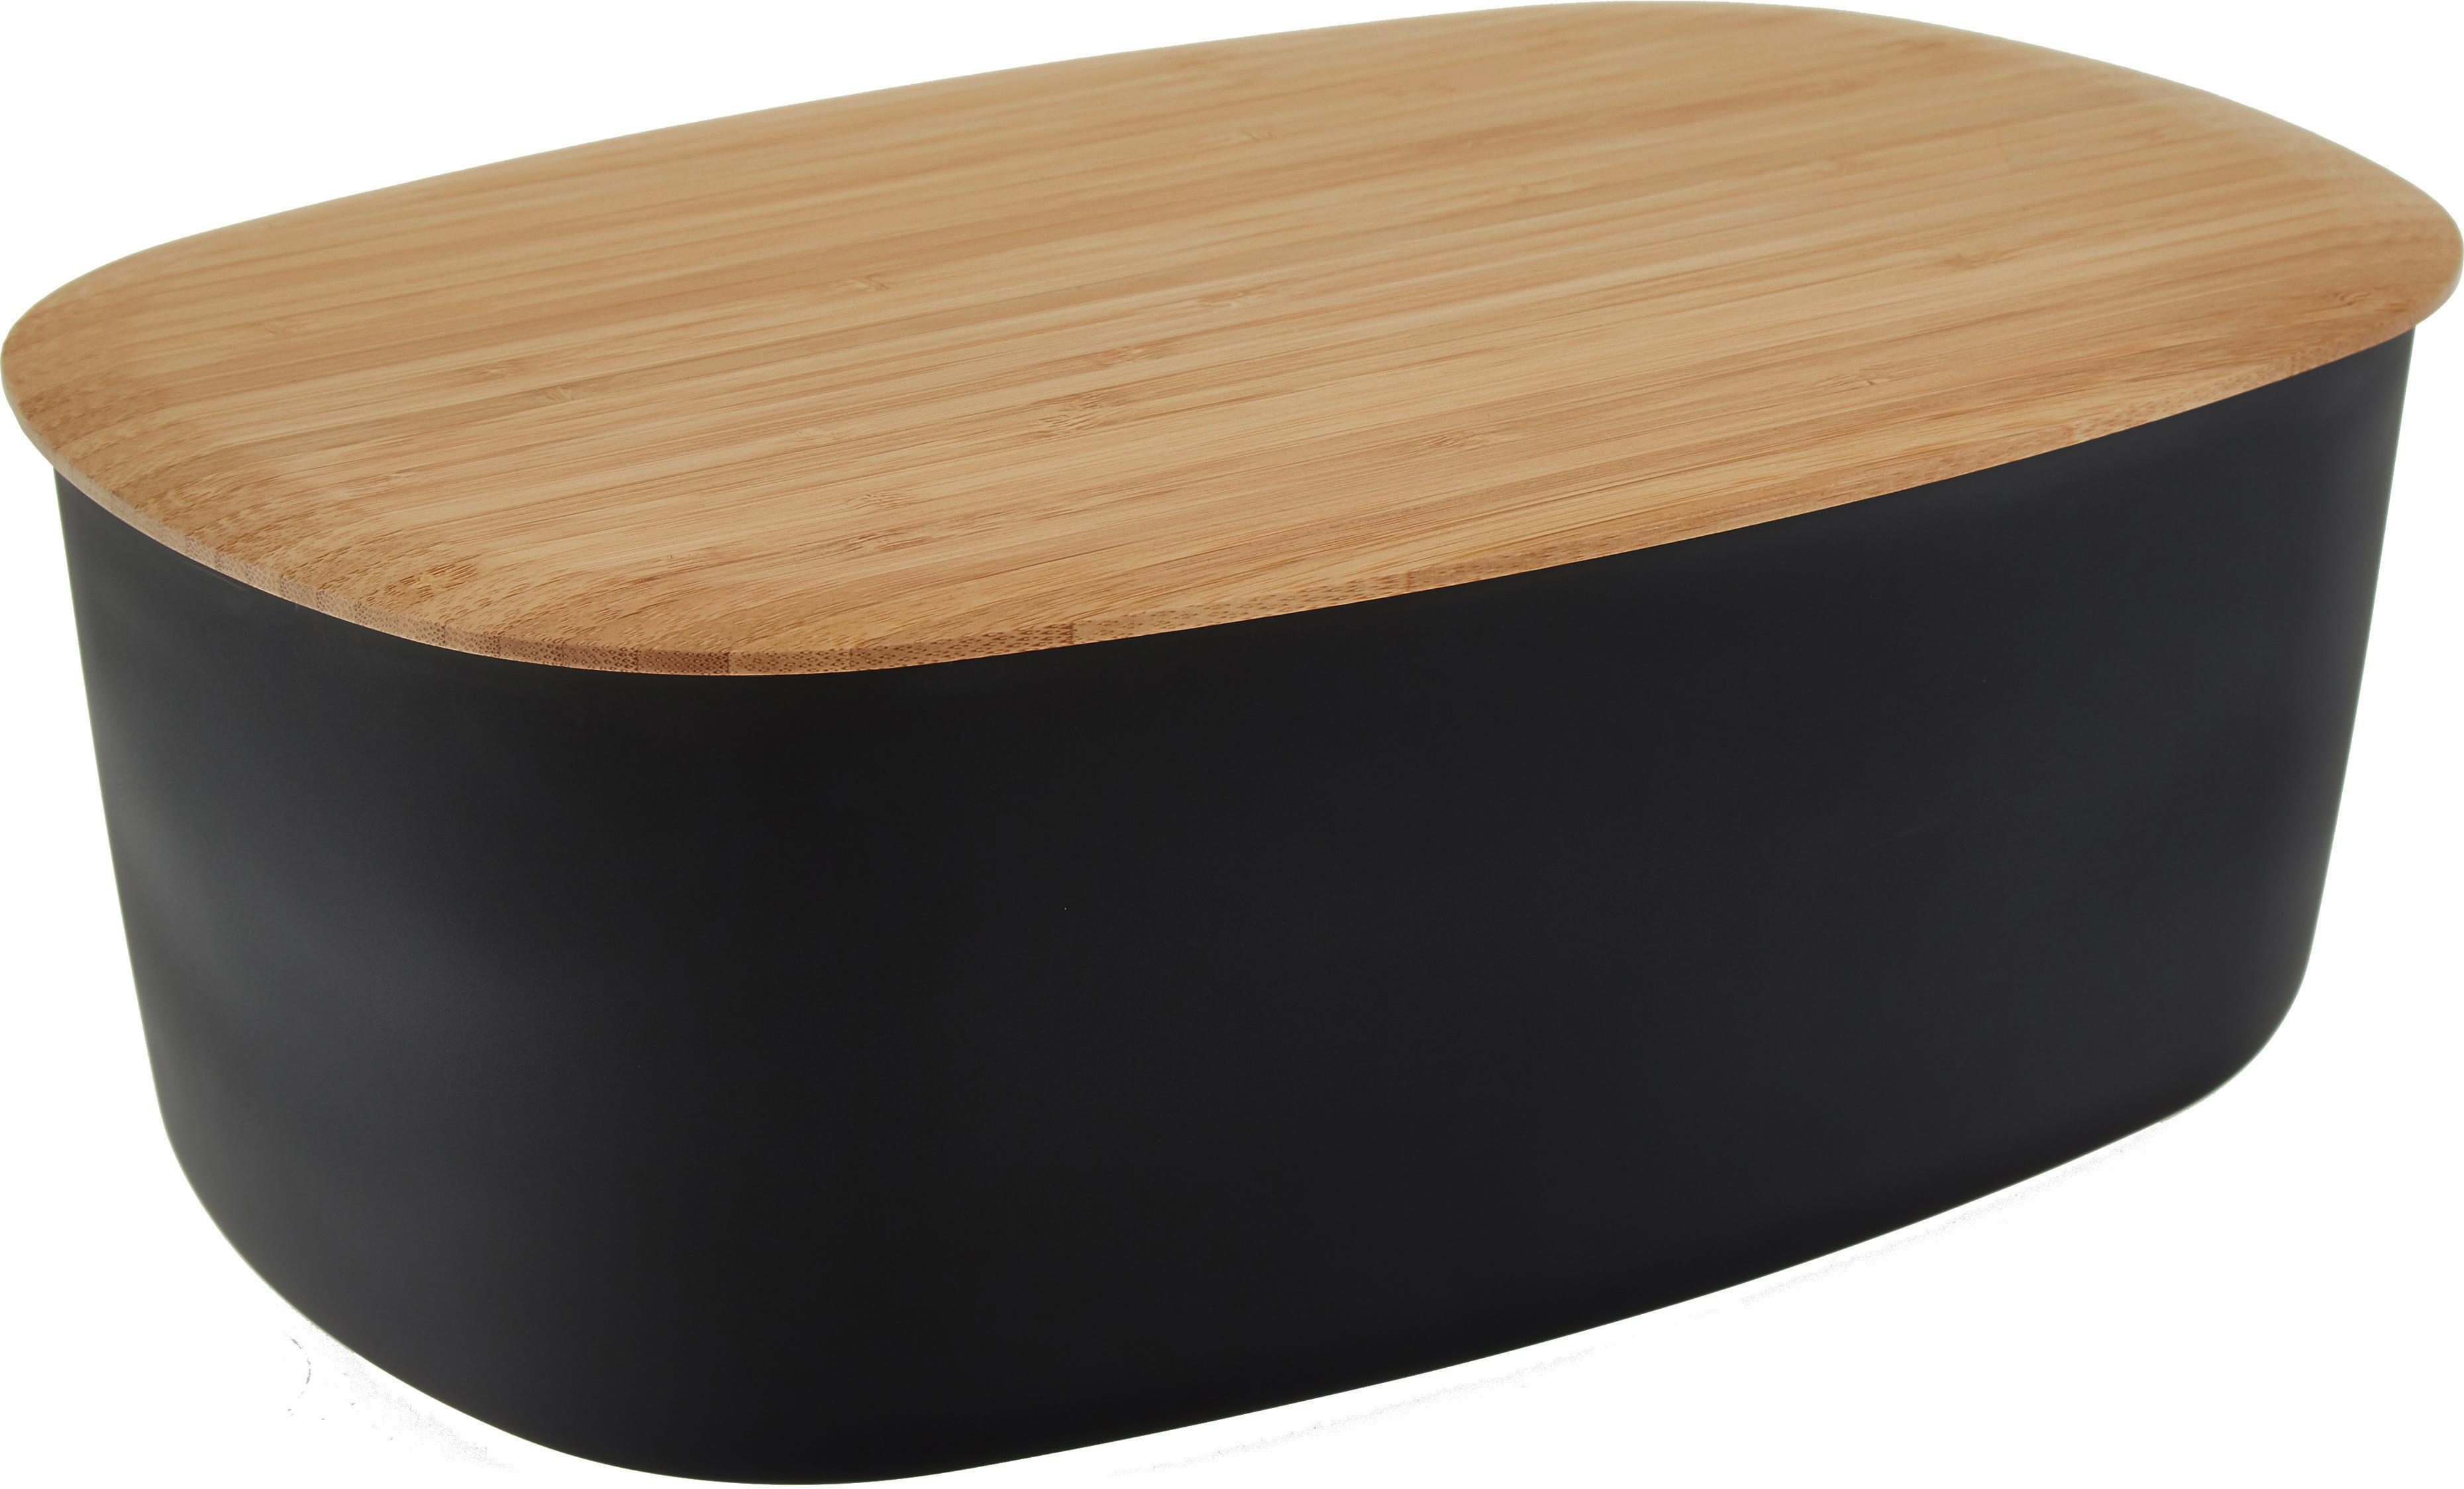 Broodtrommel Box-It, Doos: Melamine, Deksel: Bamboe, Doos: Zwart<br>Deksel: Bruin, 35 x 12 cm